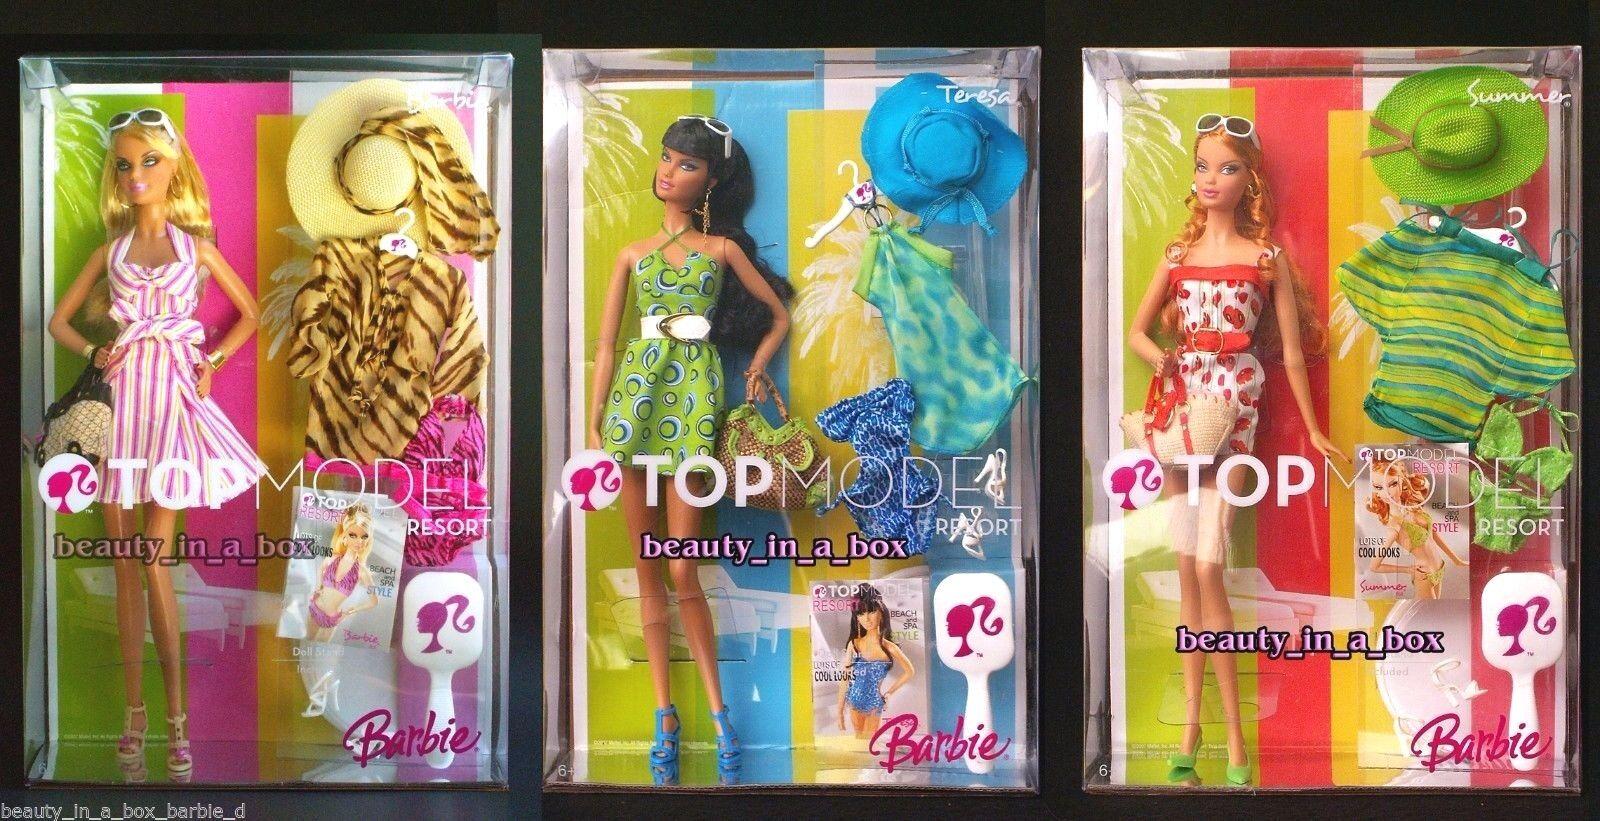 Top Model Resort Teresa Doll Summer Barbie Collector Pop Culture Fashion Lot 3VG